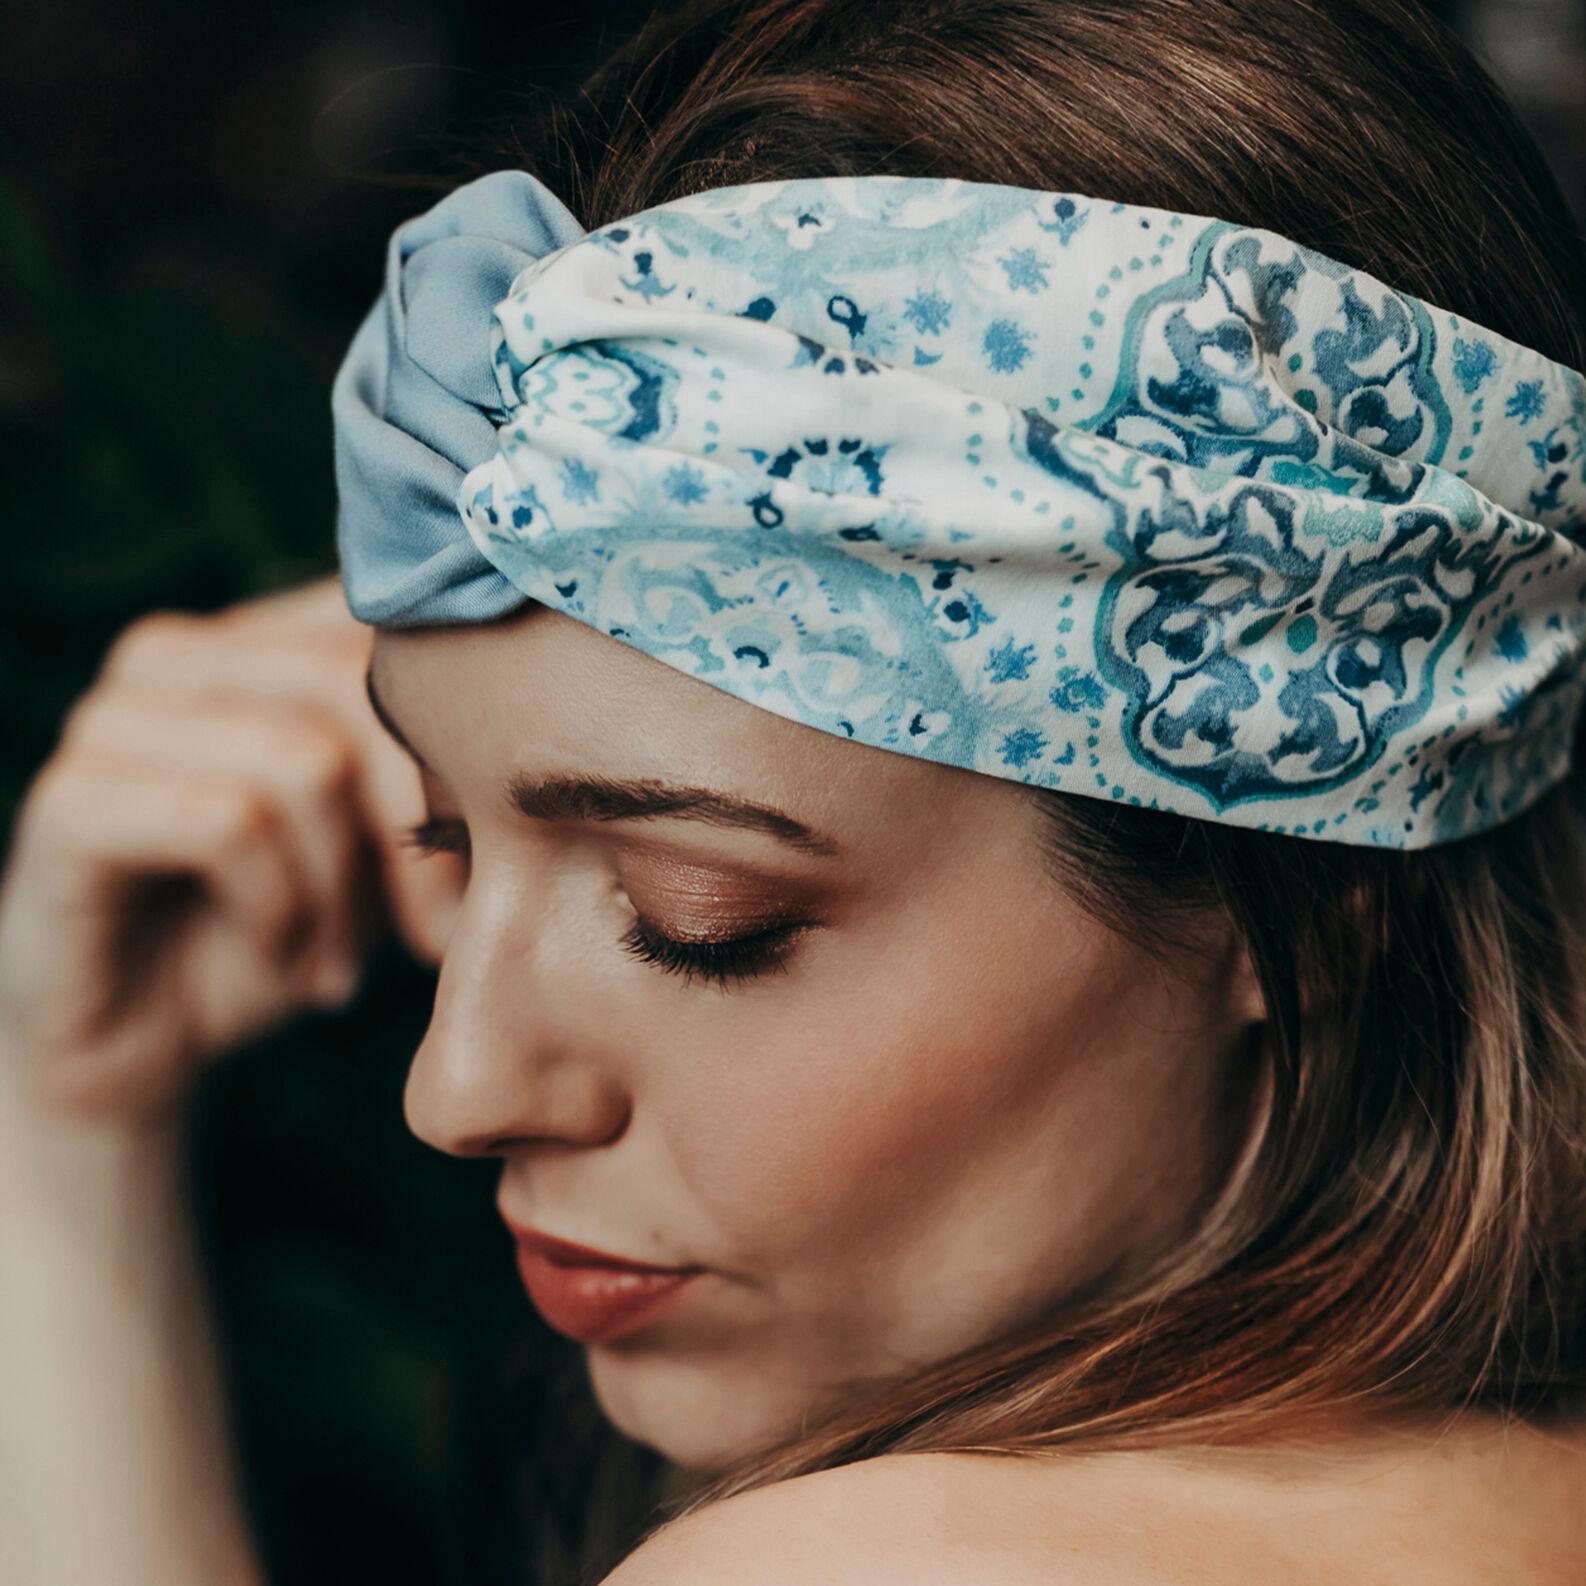 Ornamental patterned headband